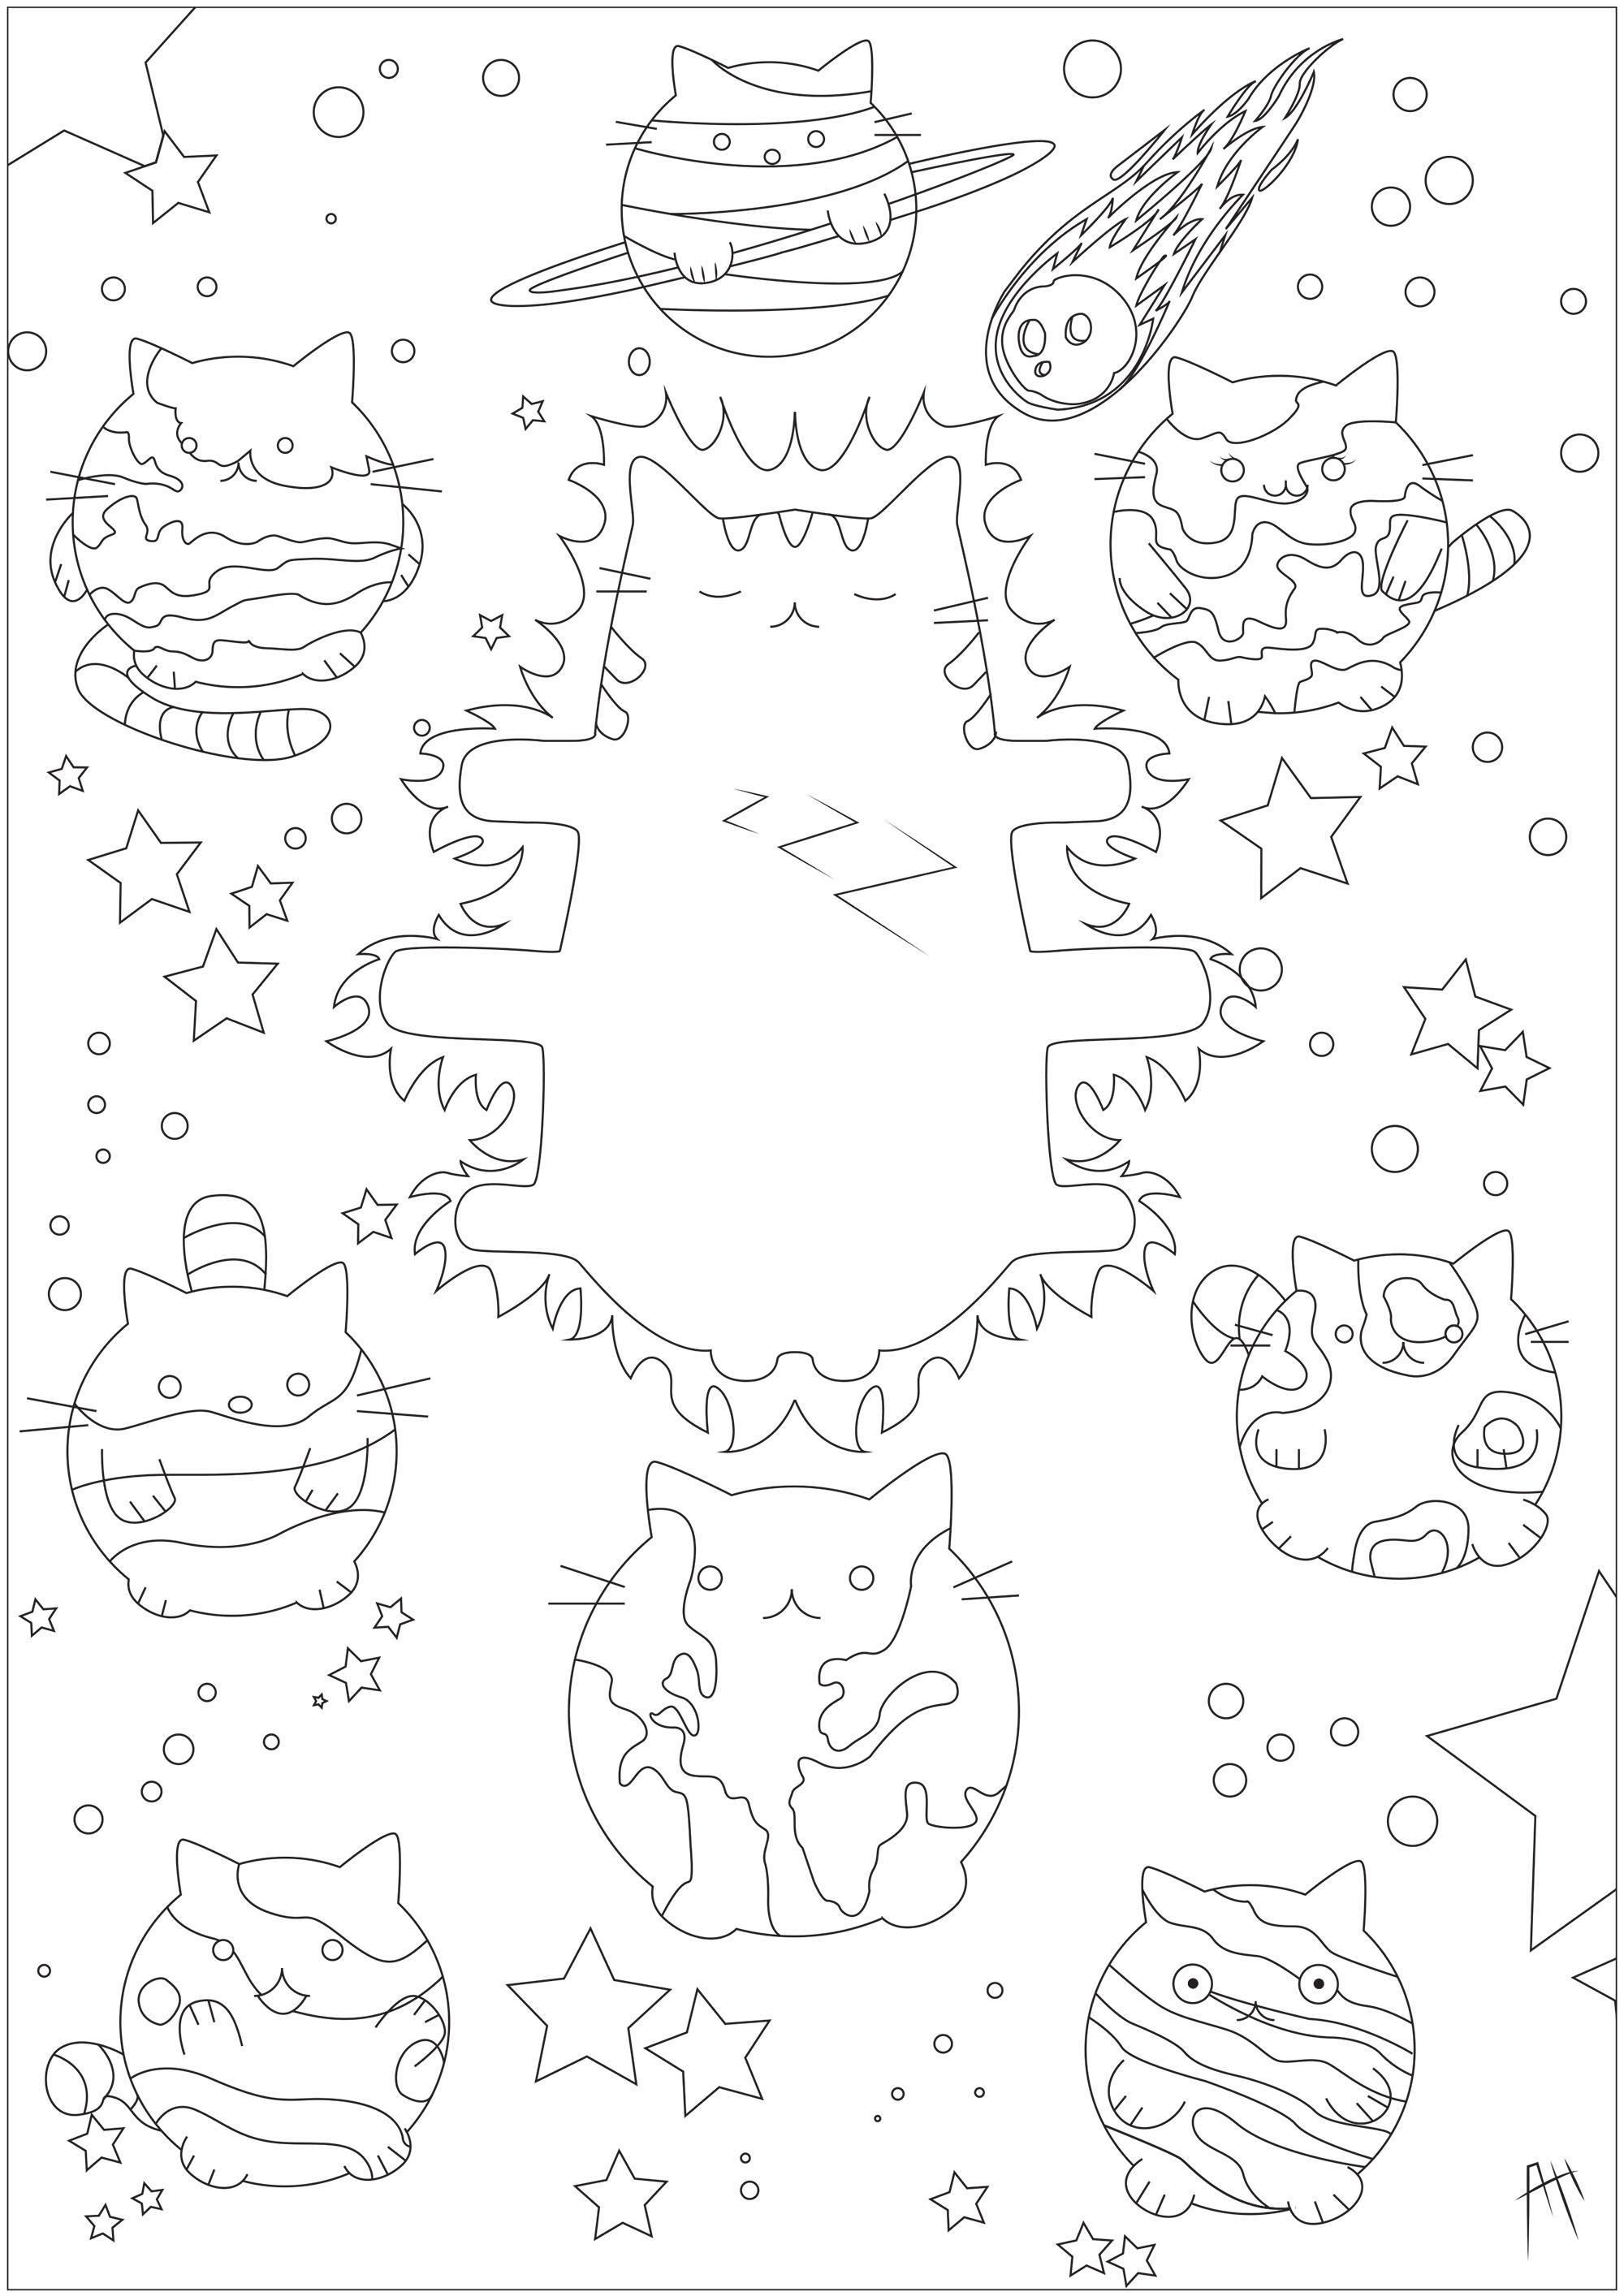 Malbuch Fur Erwachsene : Doodle art / Doodling - 4